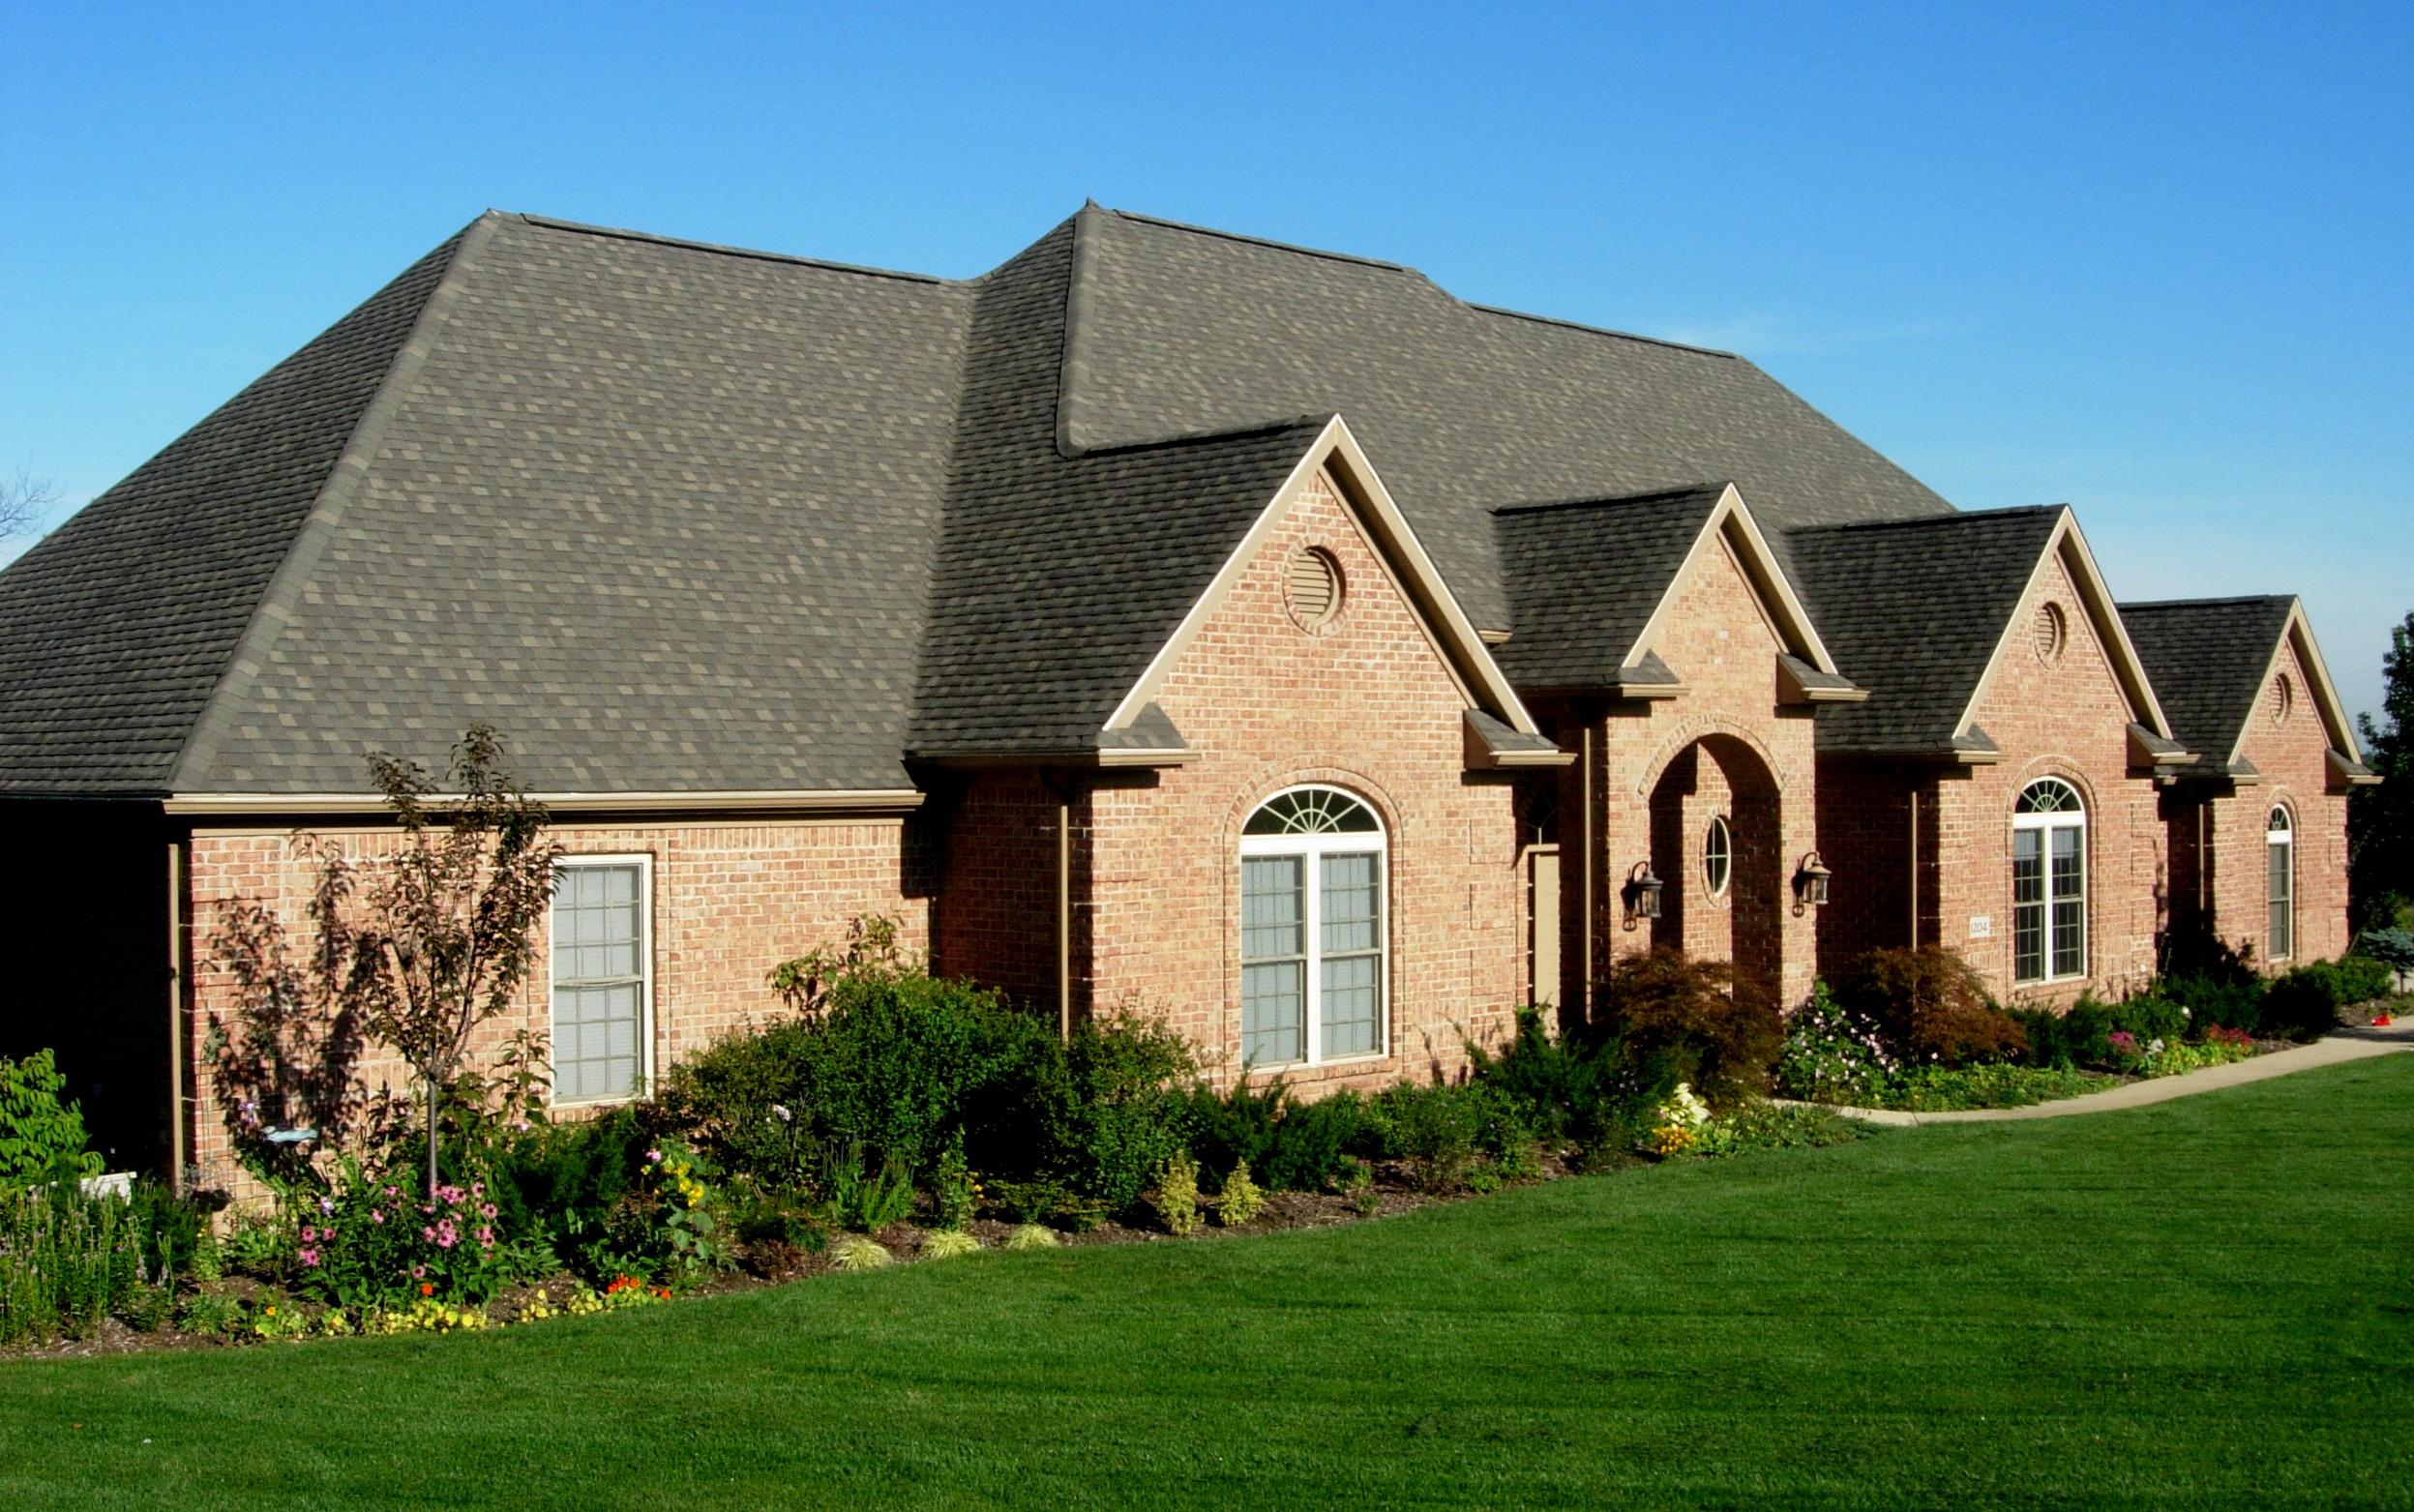 Brick homes timeless and elegant ann arbor builders for Brick home builders